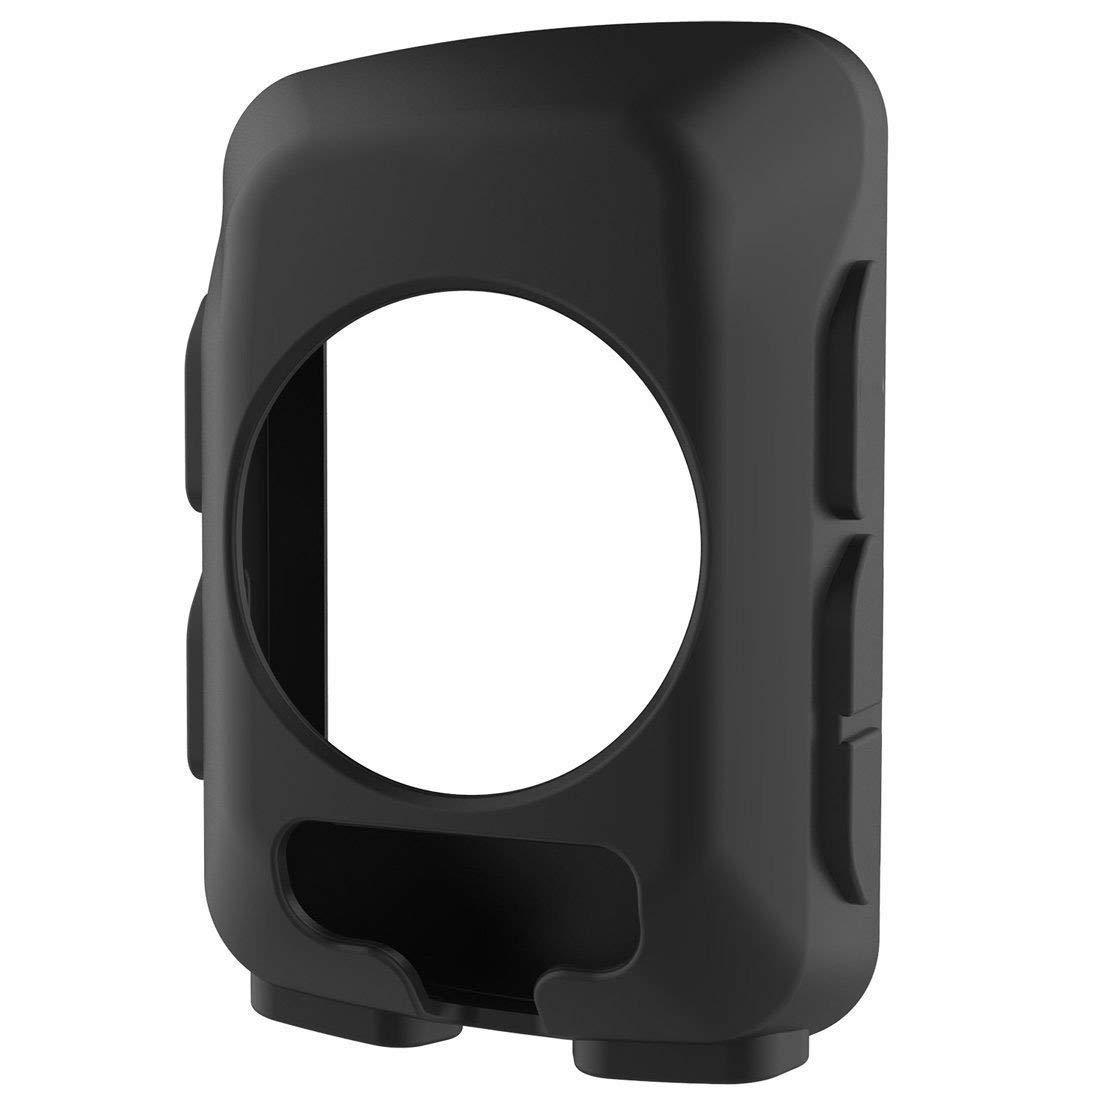 GPS Bike Computer Accessories Garmin Edge 520 Silicone Protective Case FLAG STORE Garmin Edge 520 Case Silicone Protective Cover